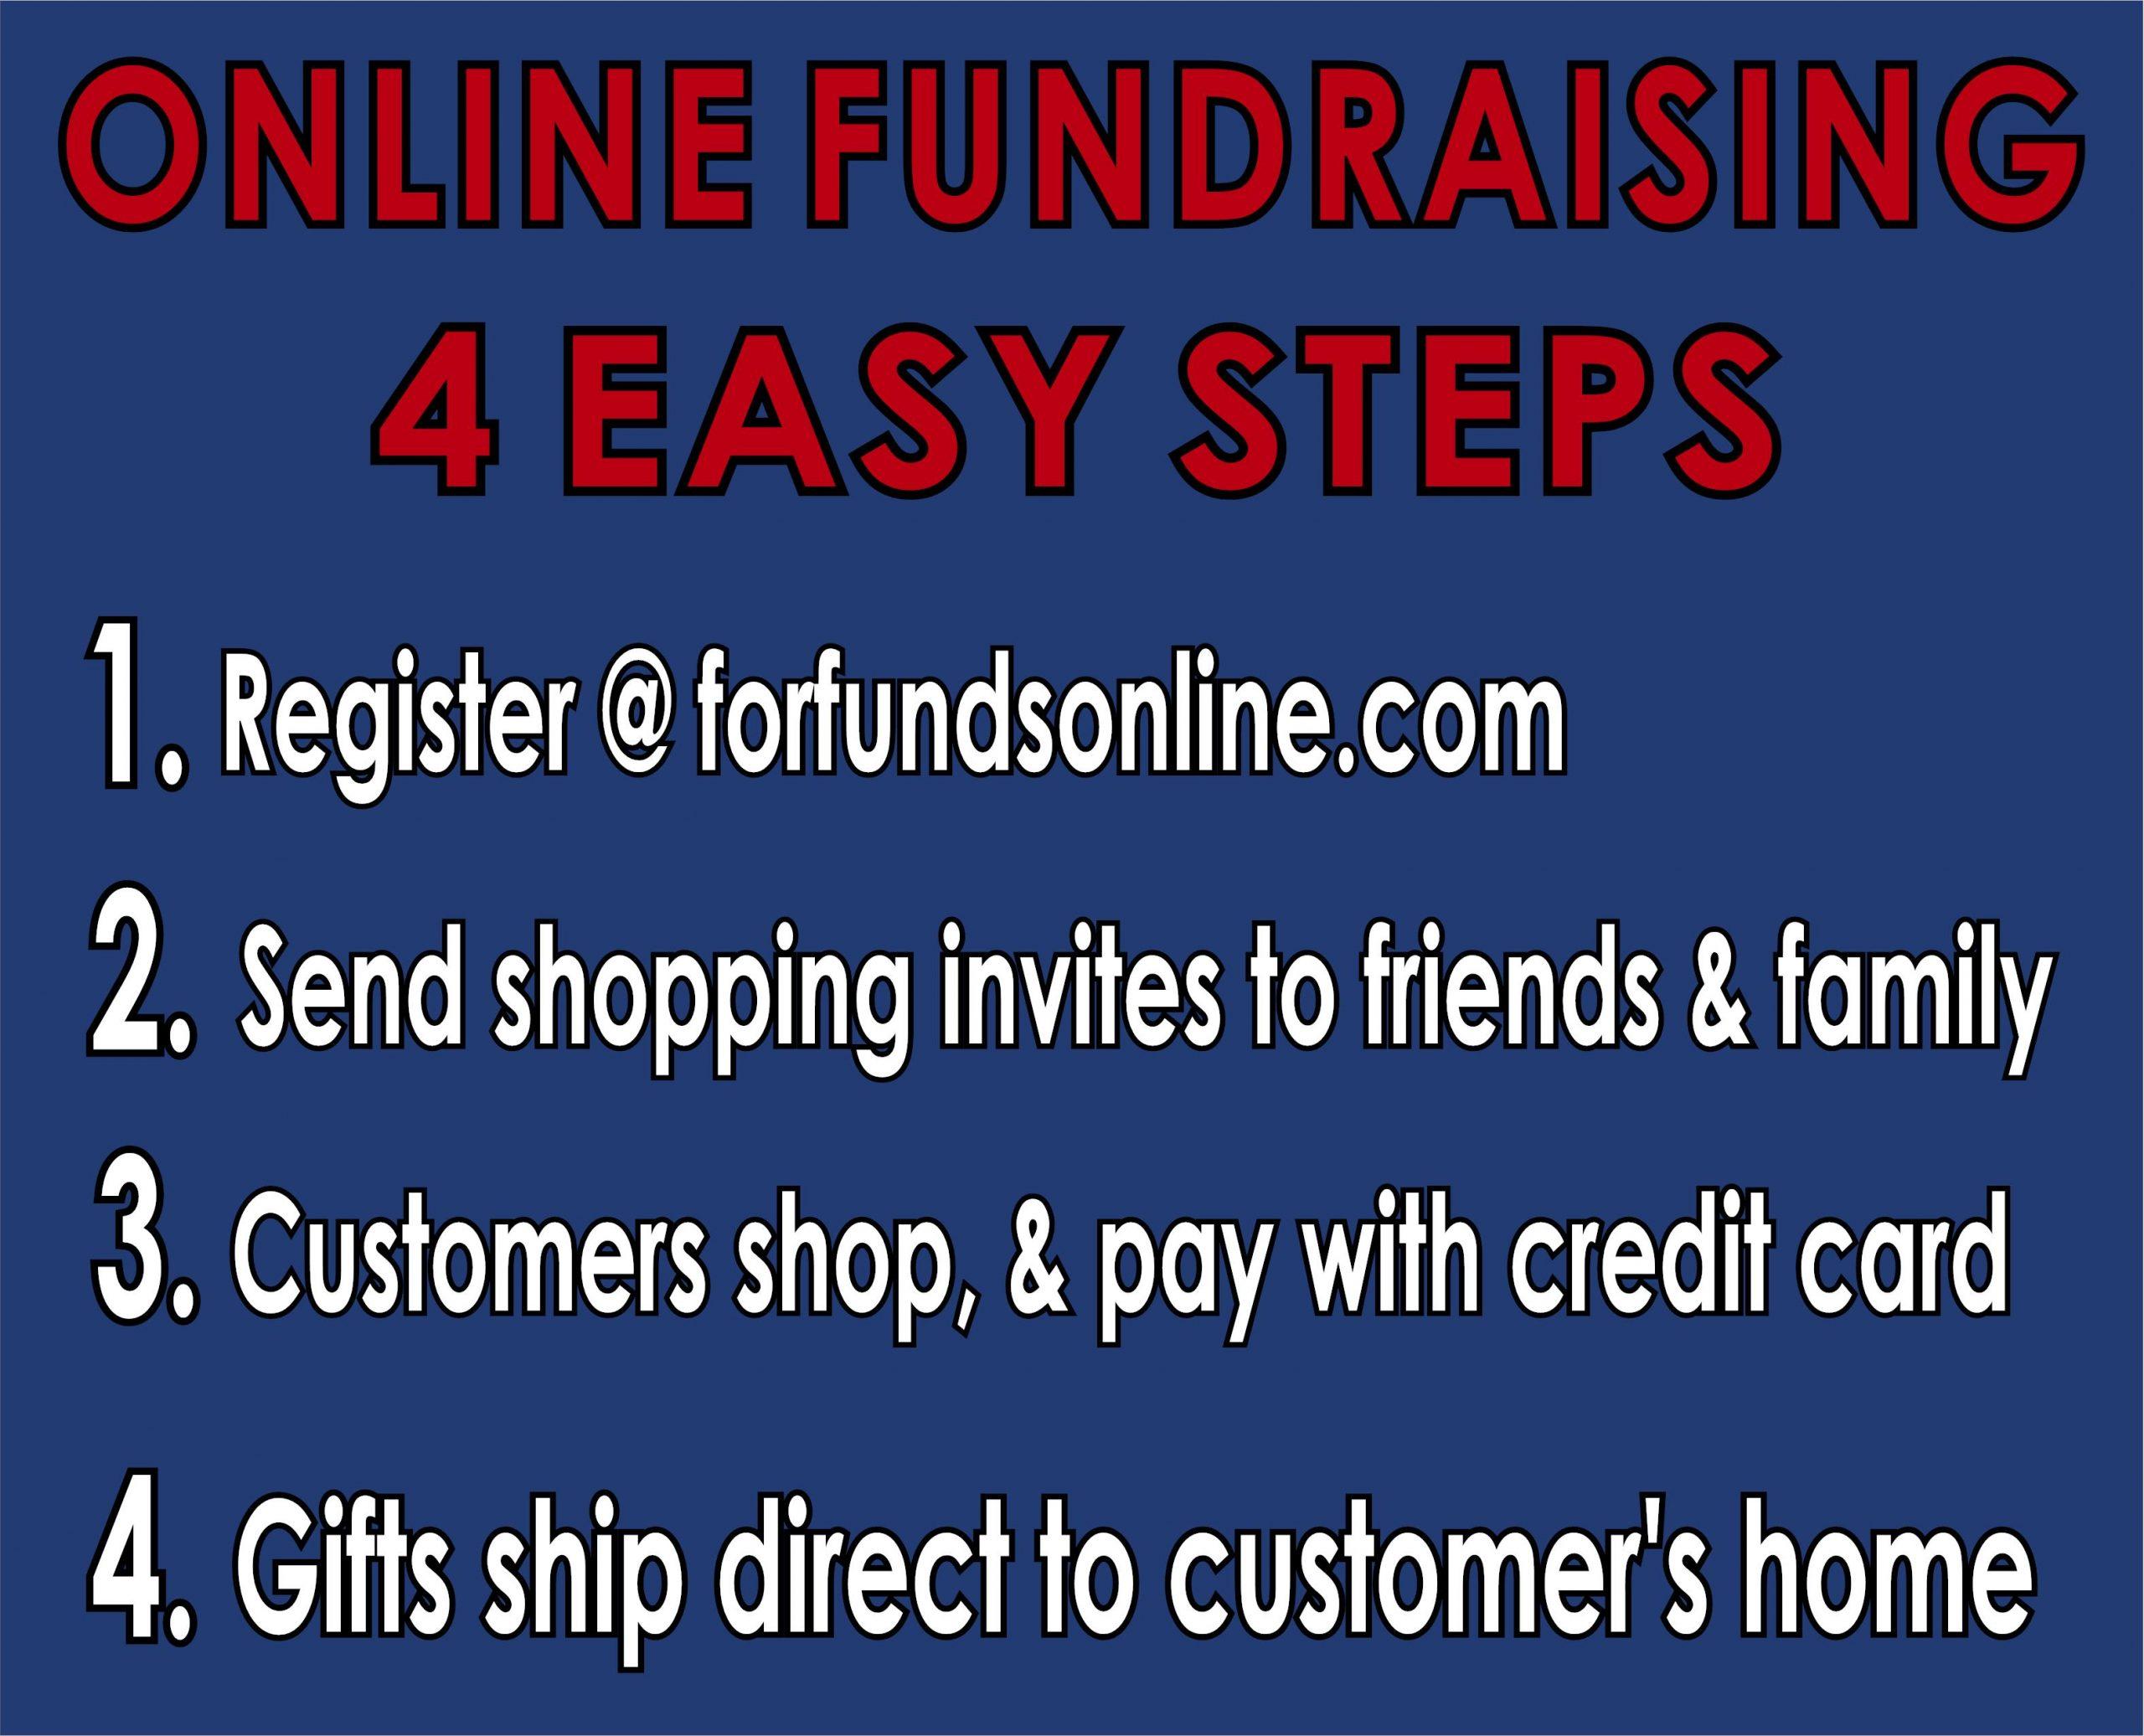 Online Fundraising in 4 Easy Steps